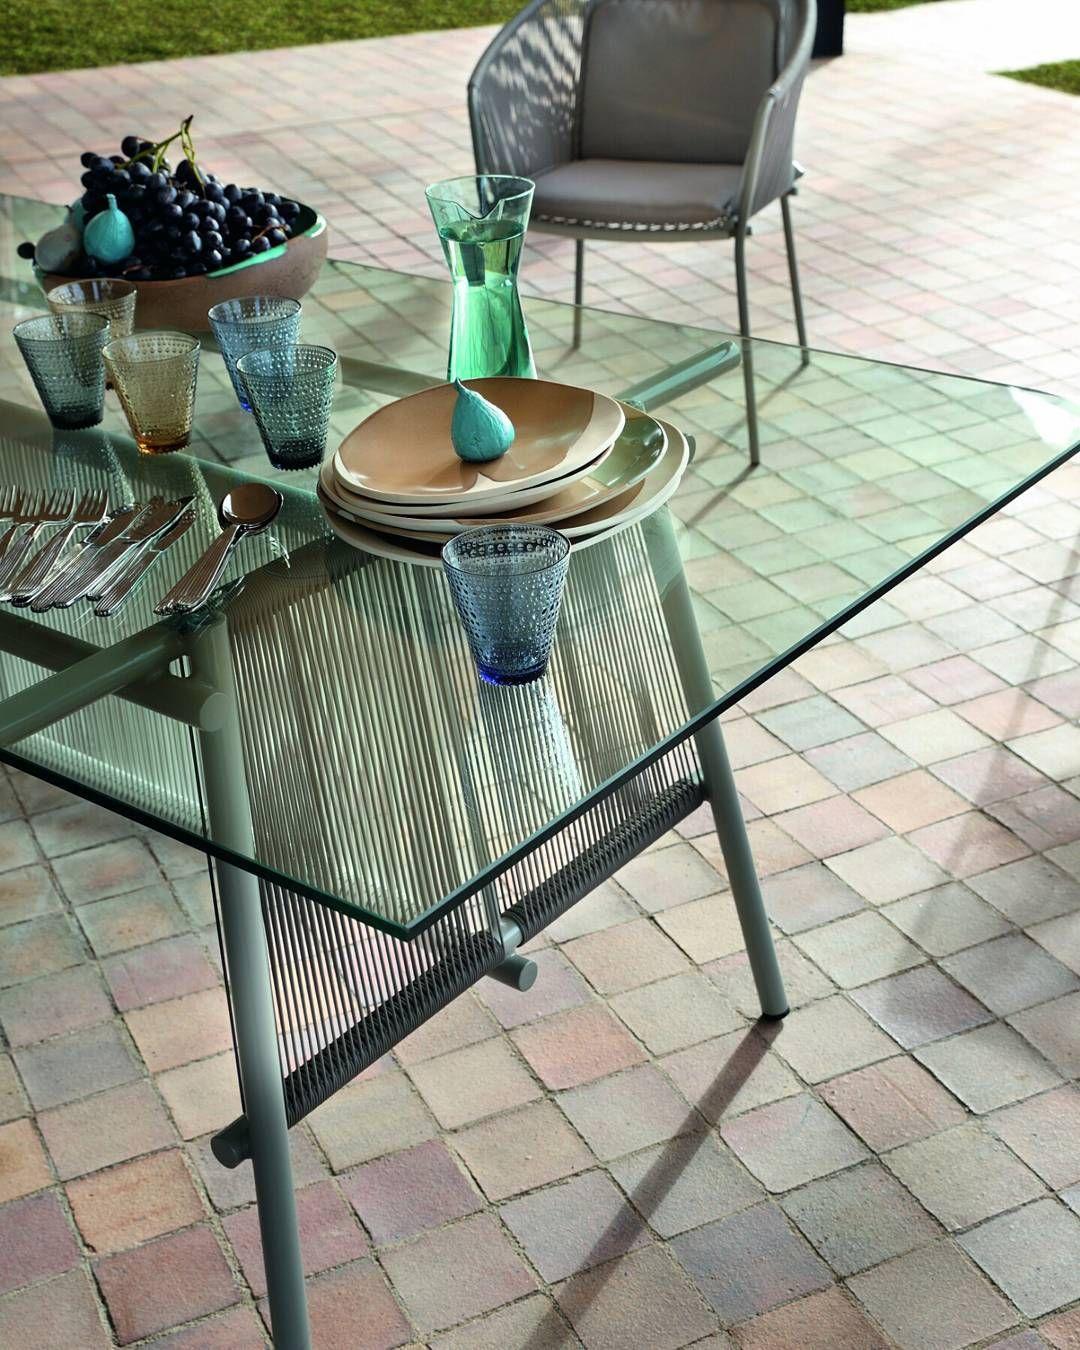 Italian Luxury Furniture Designer Furniture Singapore Da Vinci Lifestyle Outdoor Dining Table Outdoor Dining Outdoor Tables